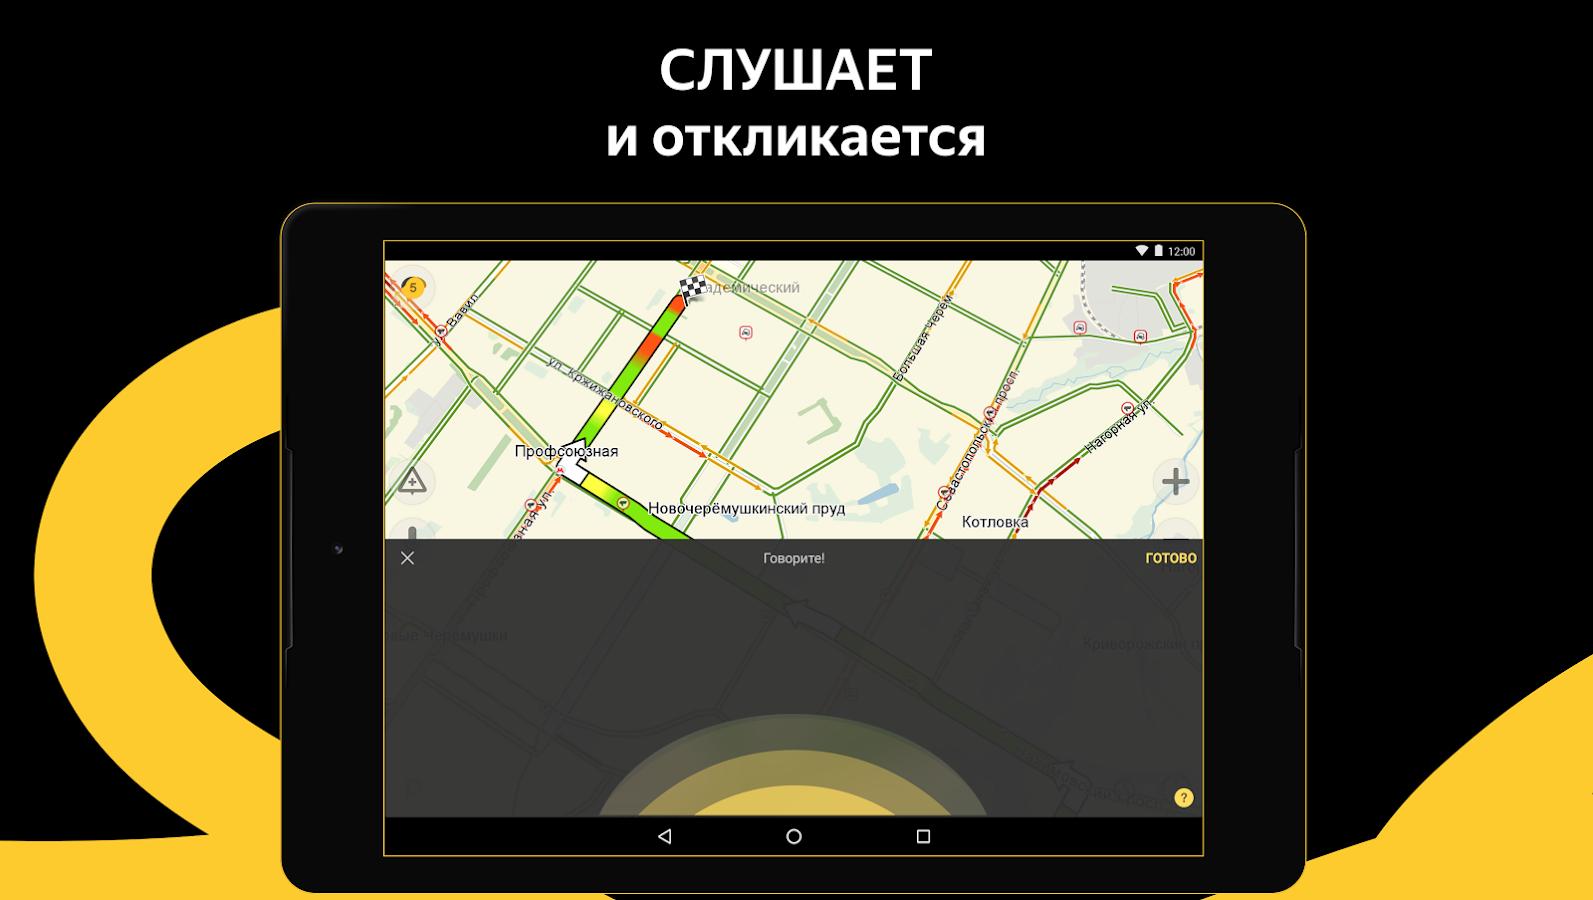 яндекс навигатор 2 95 apk